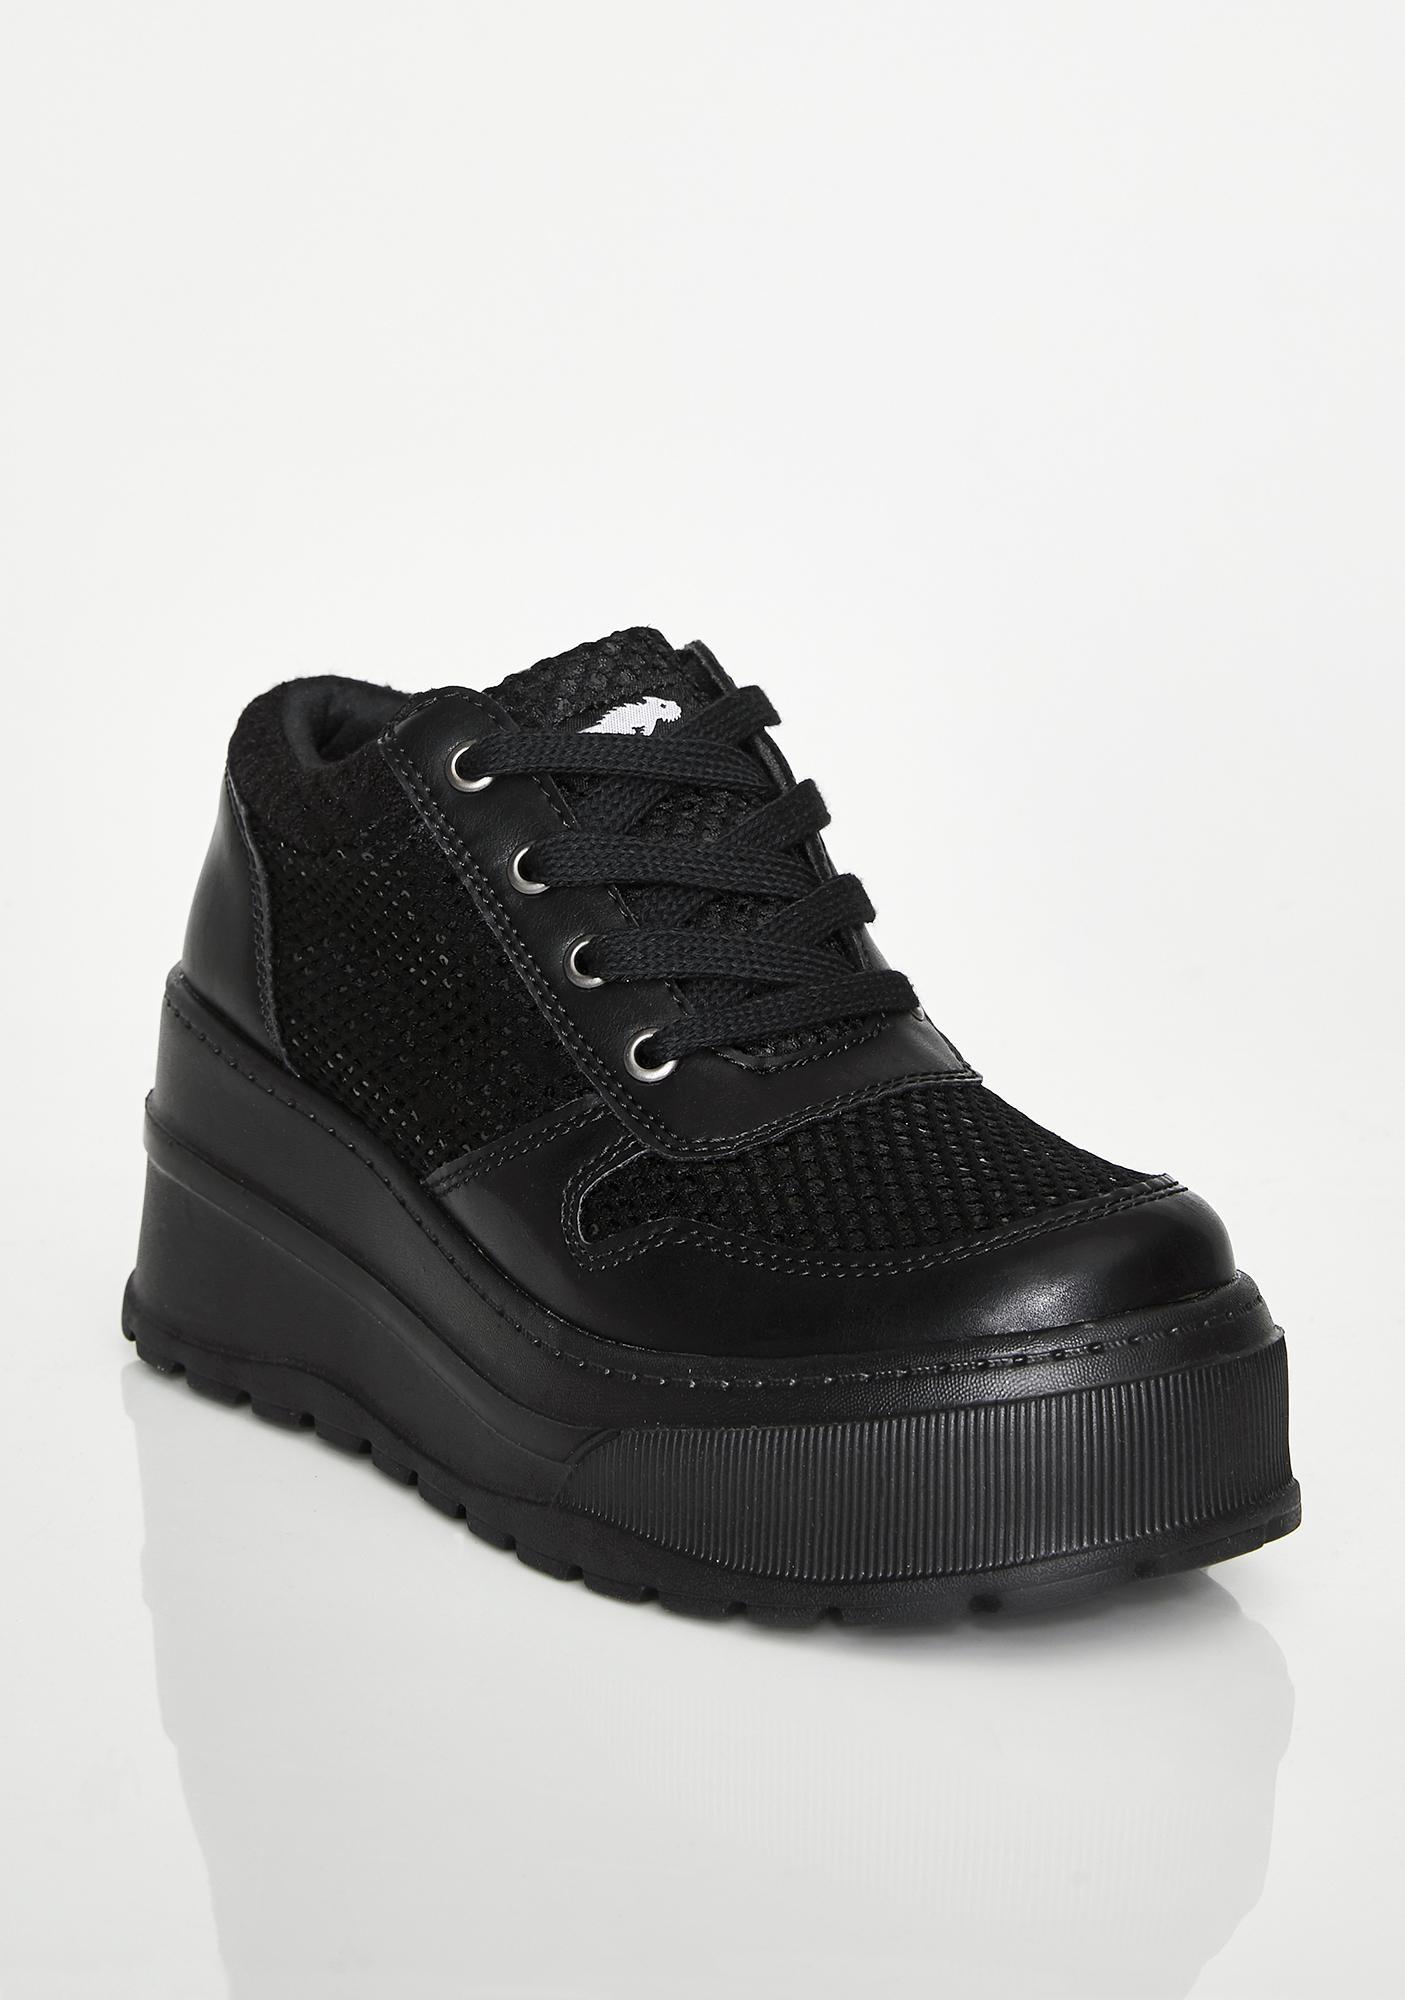 863cd2e5c84 ... Rocket Dog Cosmic Platform Sneakers